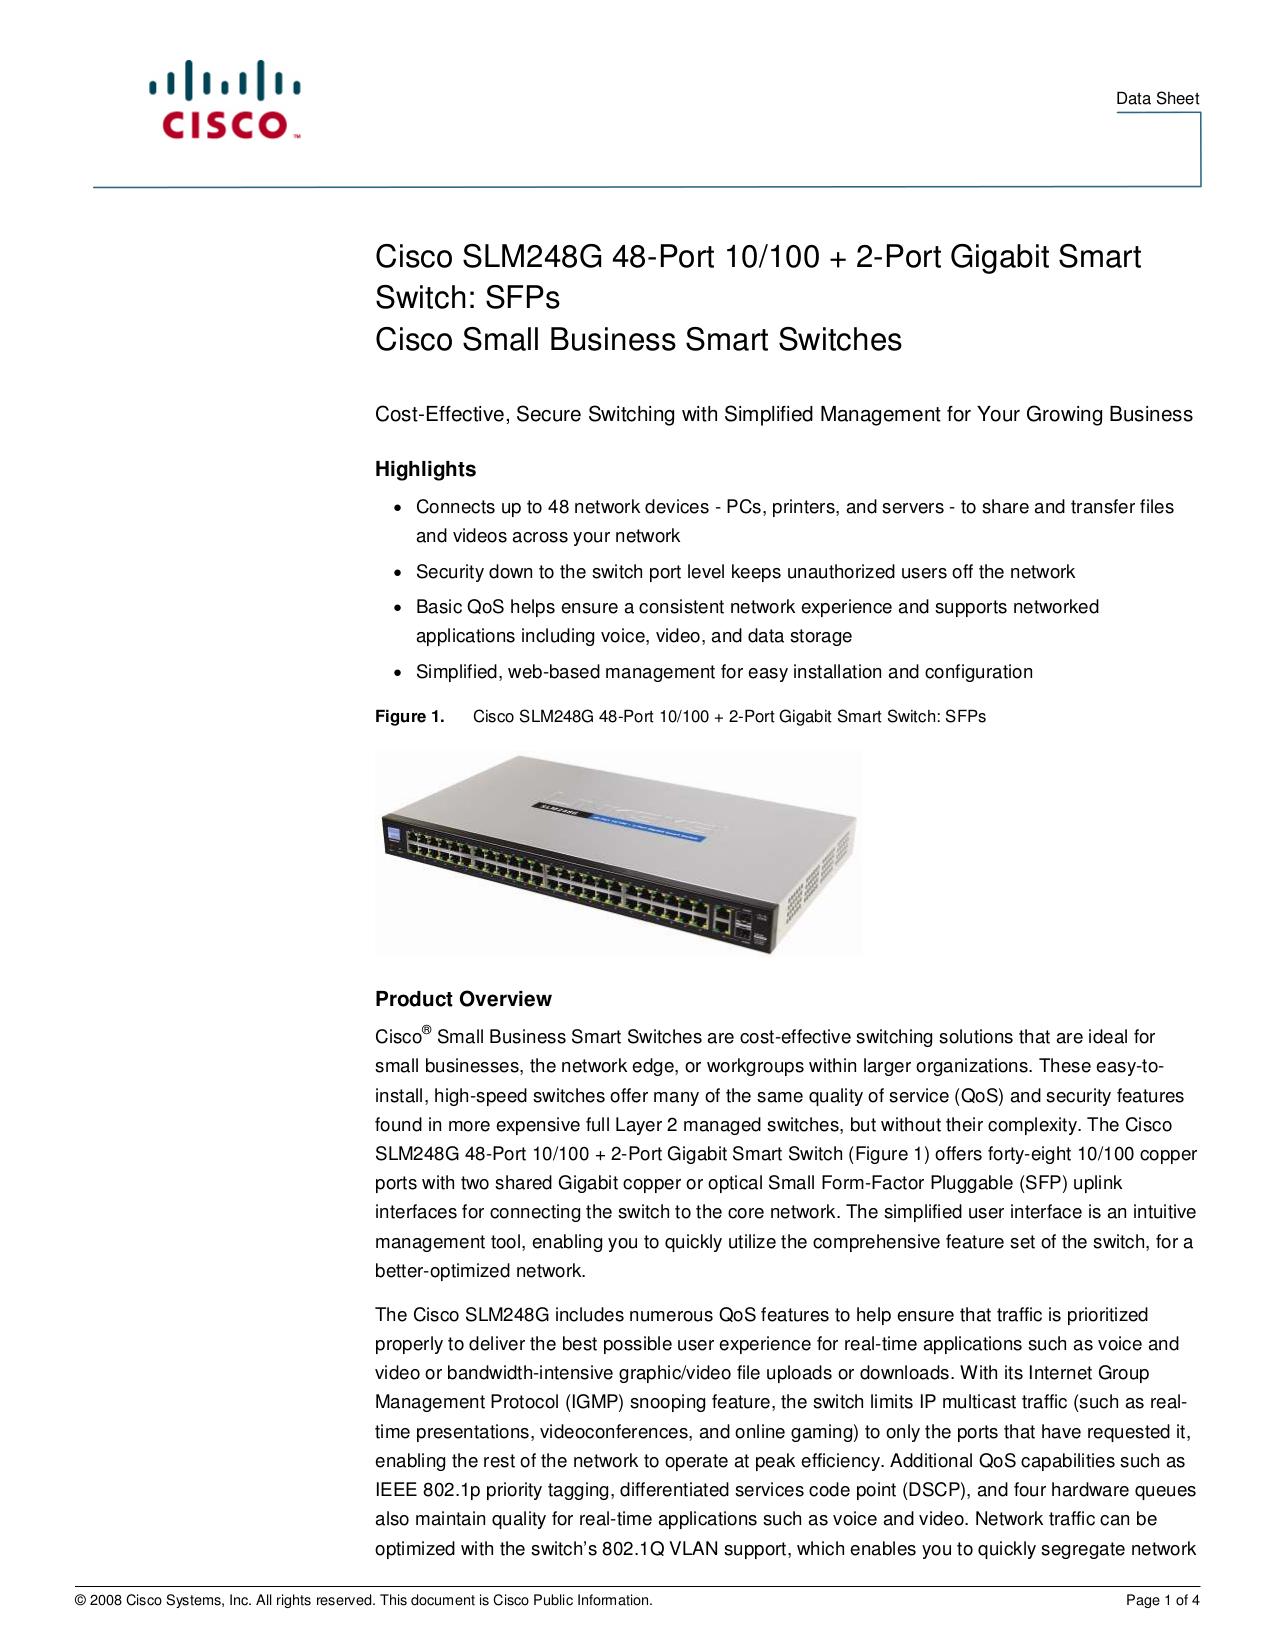 pdf for Linksys Switch SLM248G manual